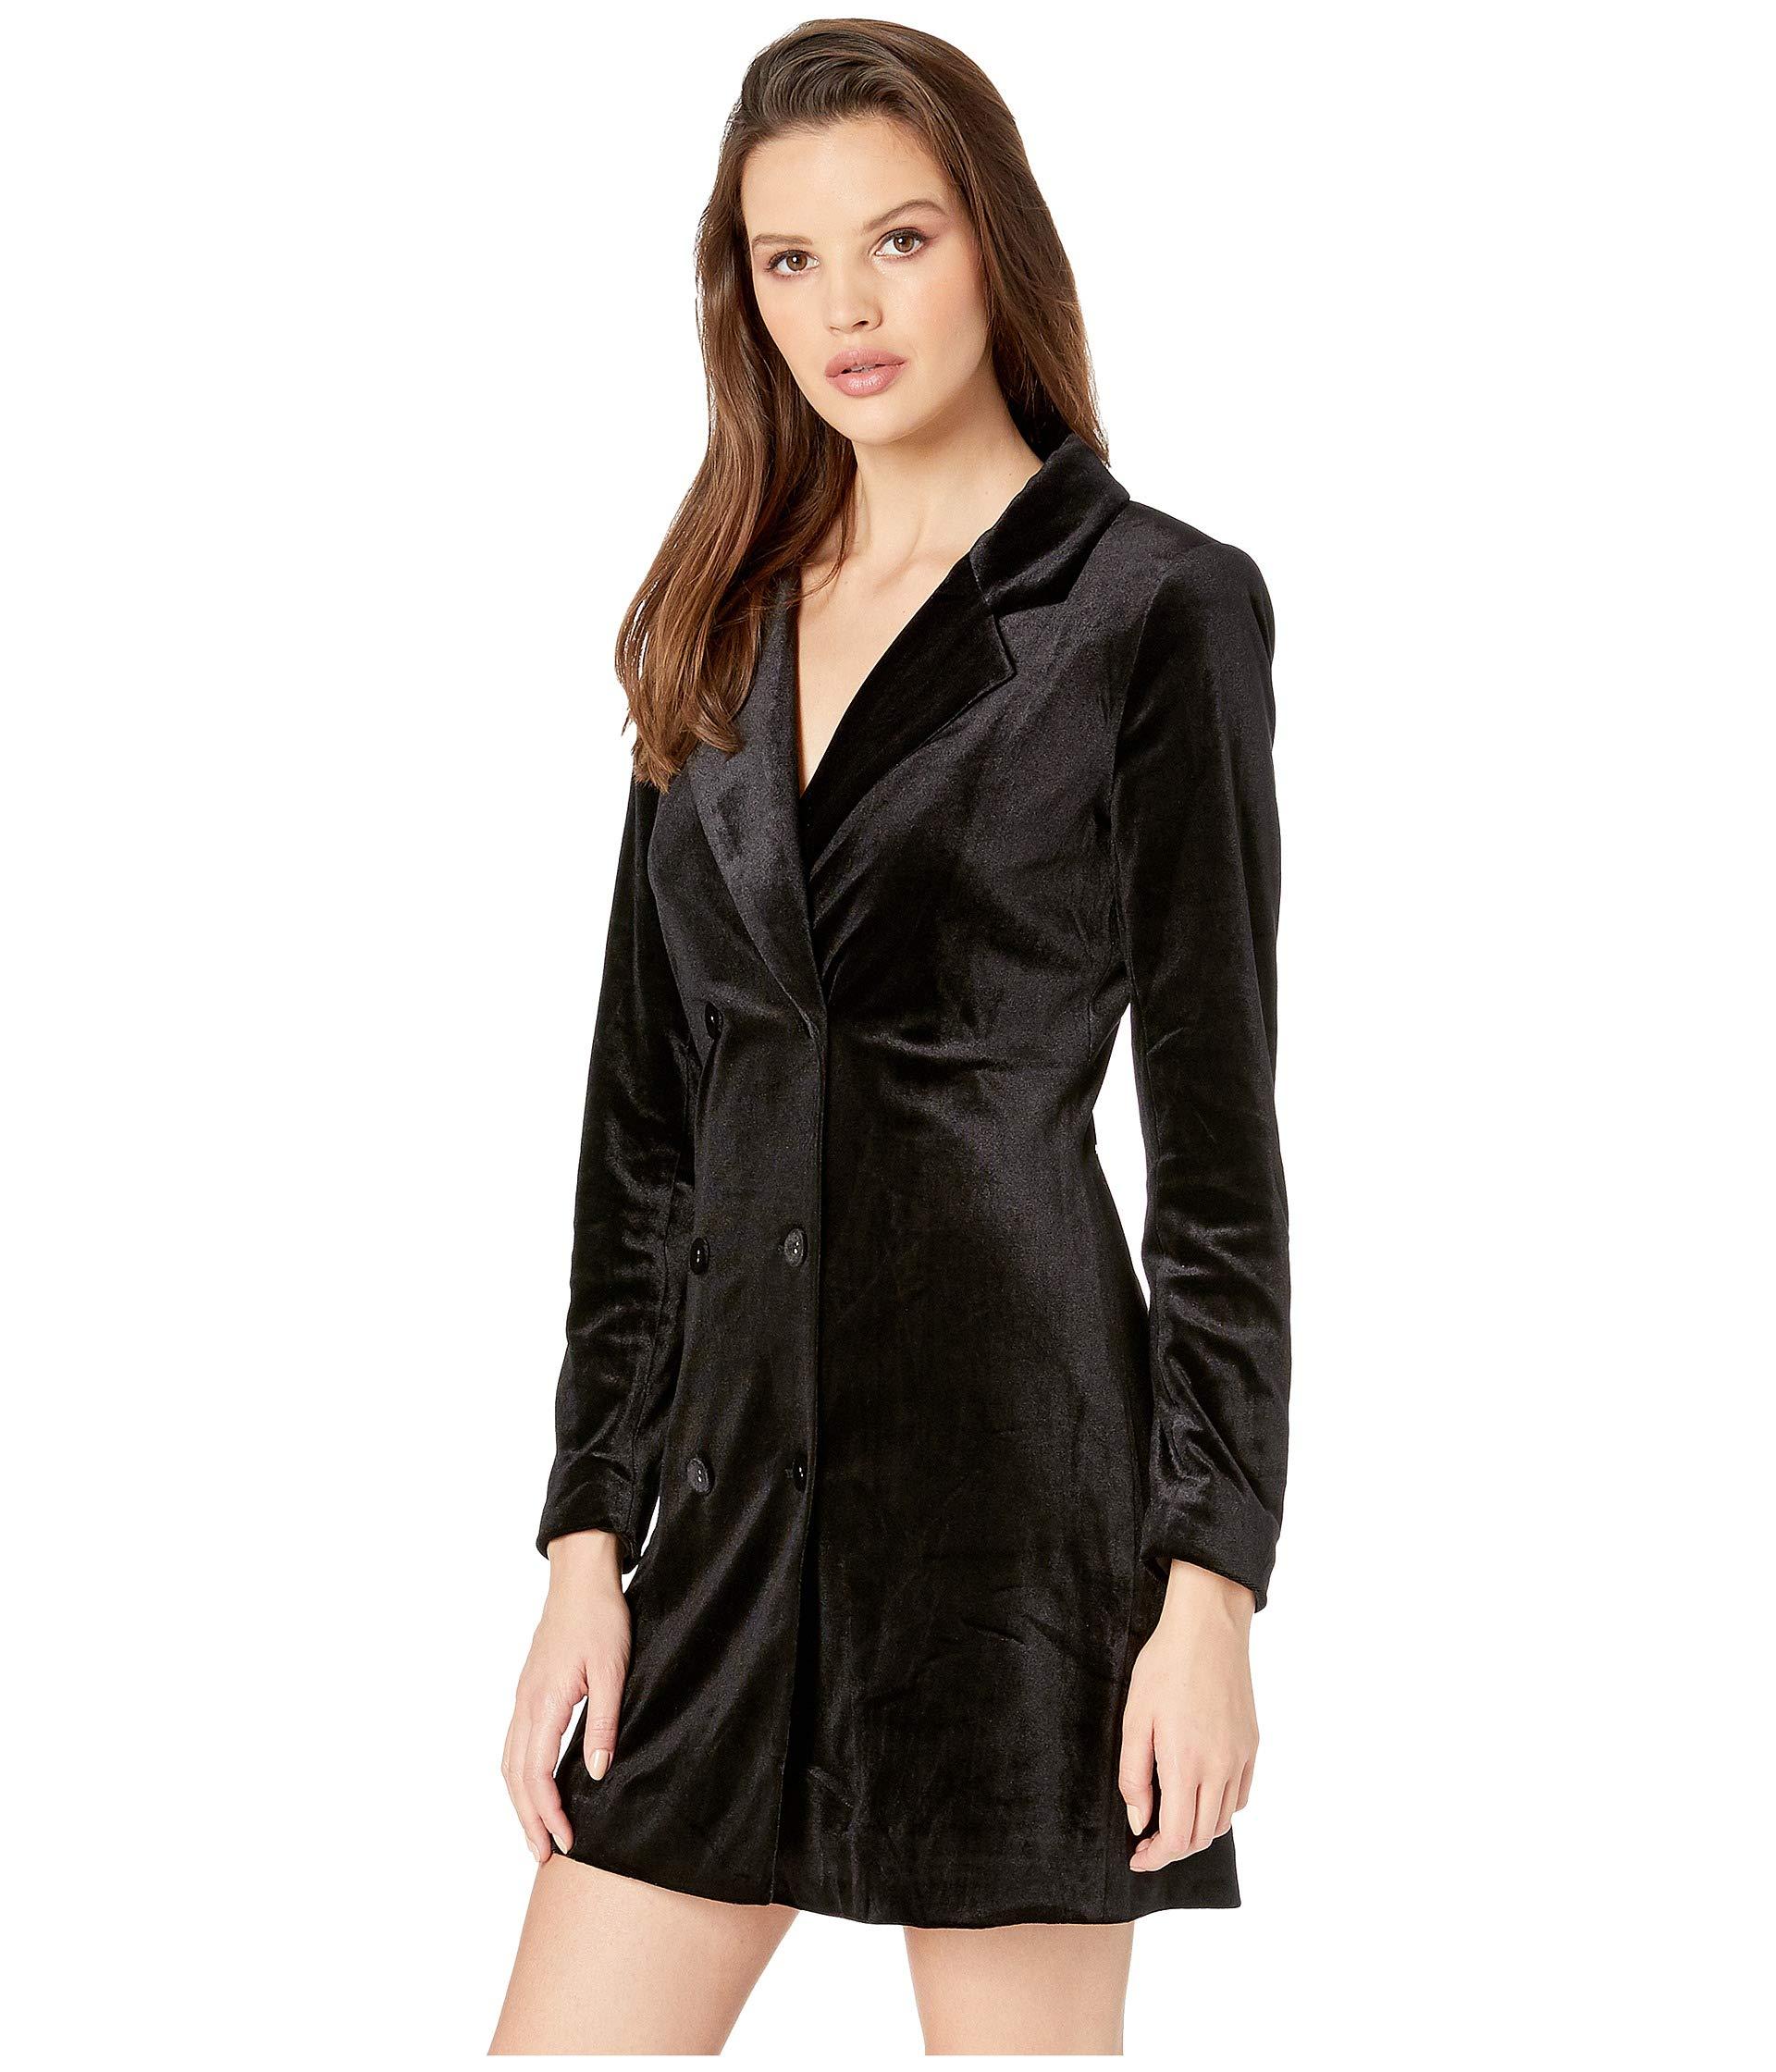 Yumi Dress Black Suit Velvet Up Kim qFxYR0